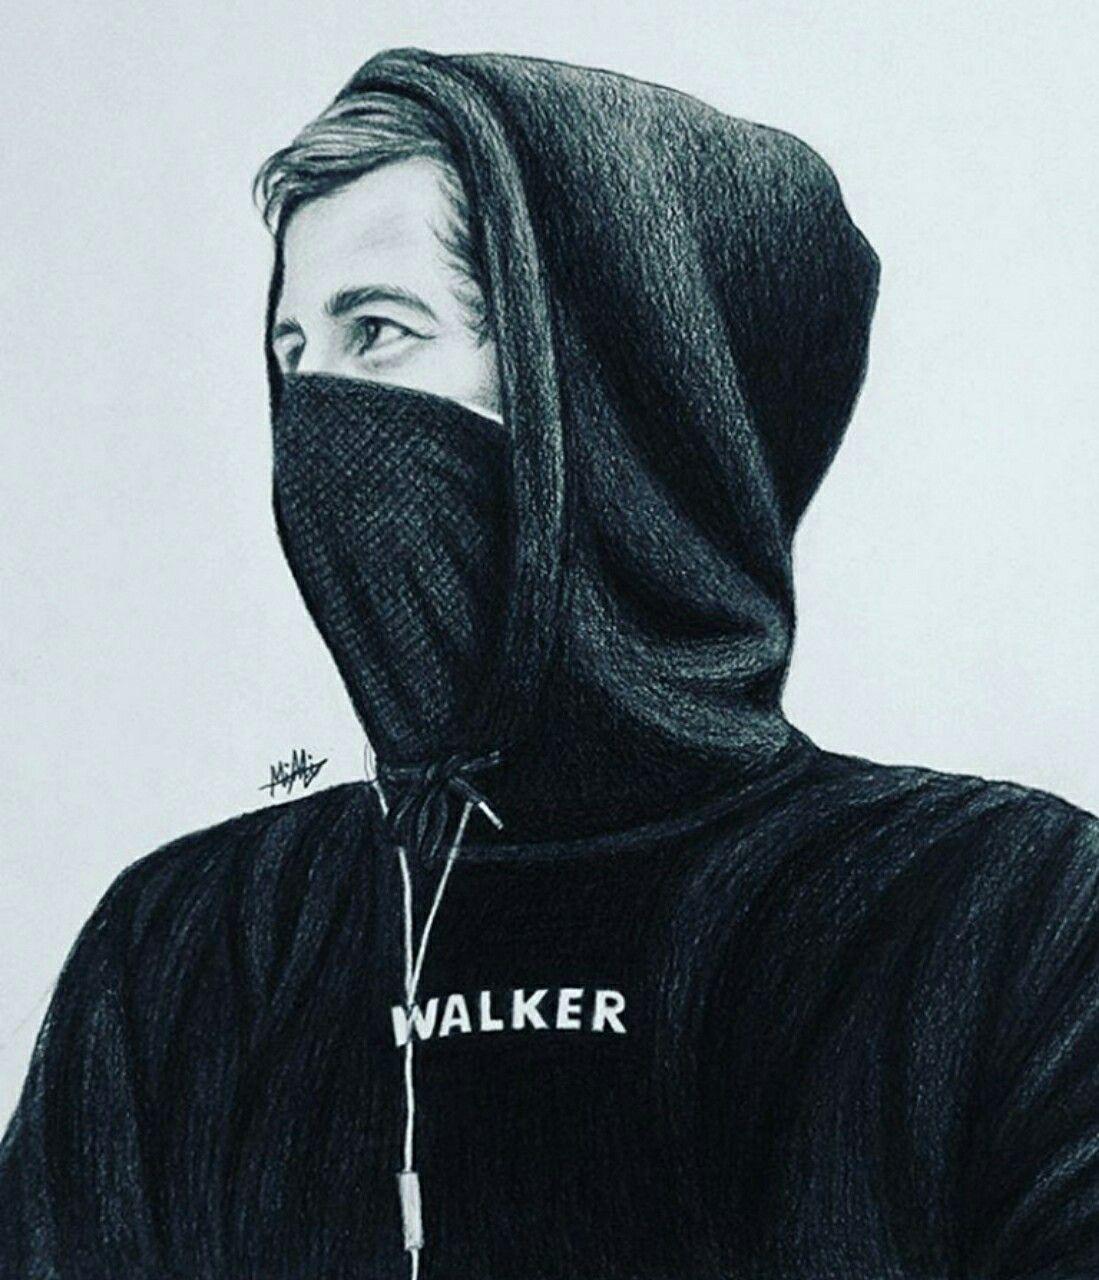 Pin de Hollimae en Alan Walker | Alan walker, Dj alan walker, Dibujos de  marshmello